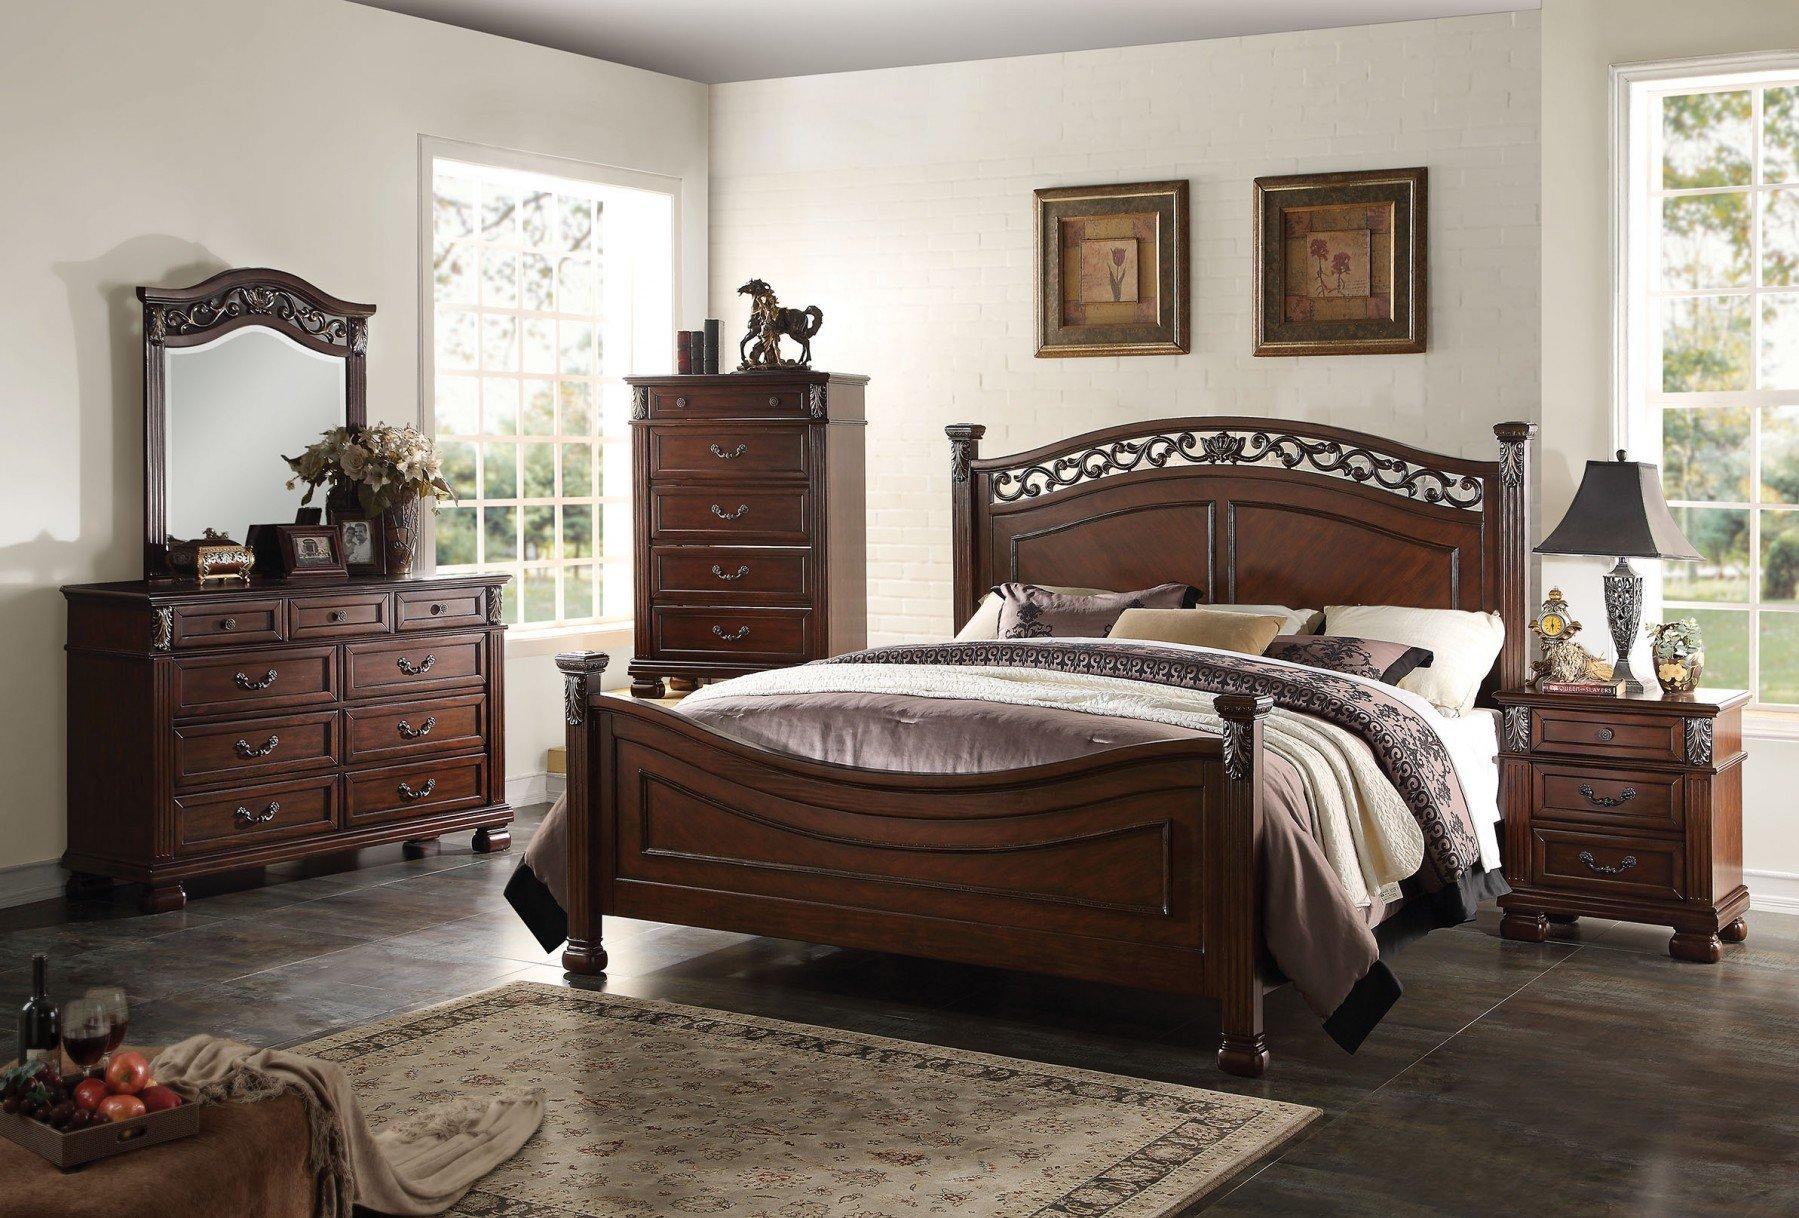 Acme Manfred Panel Bedroom Set in Dark Walnut